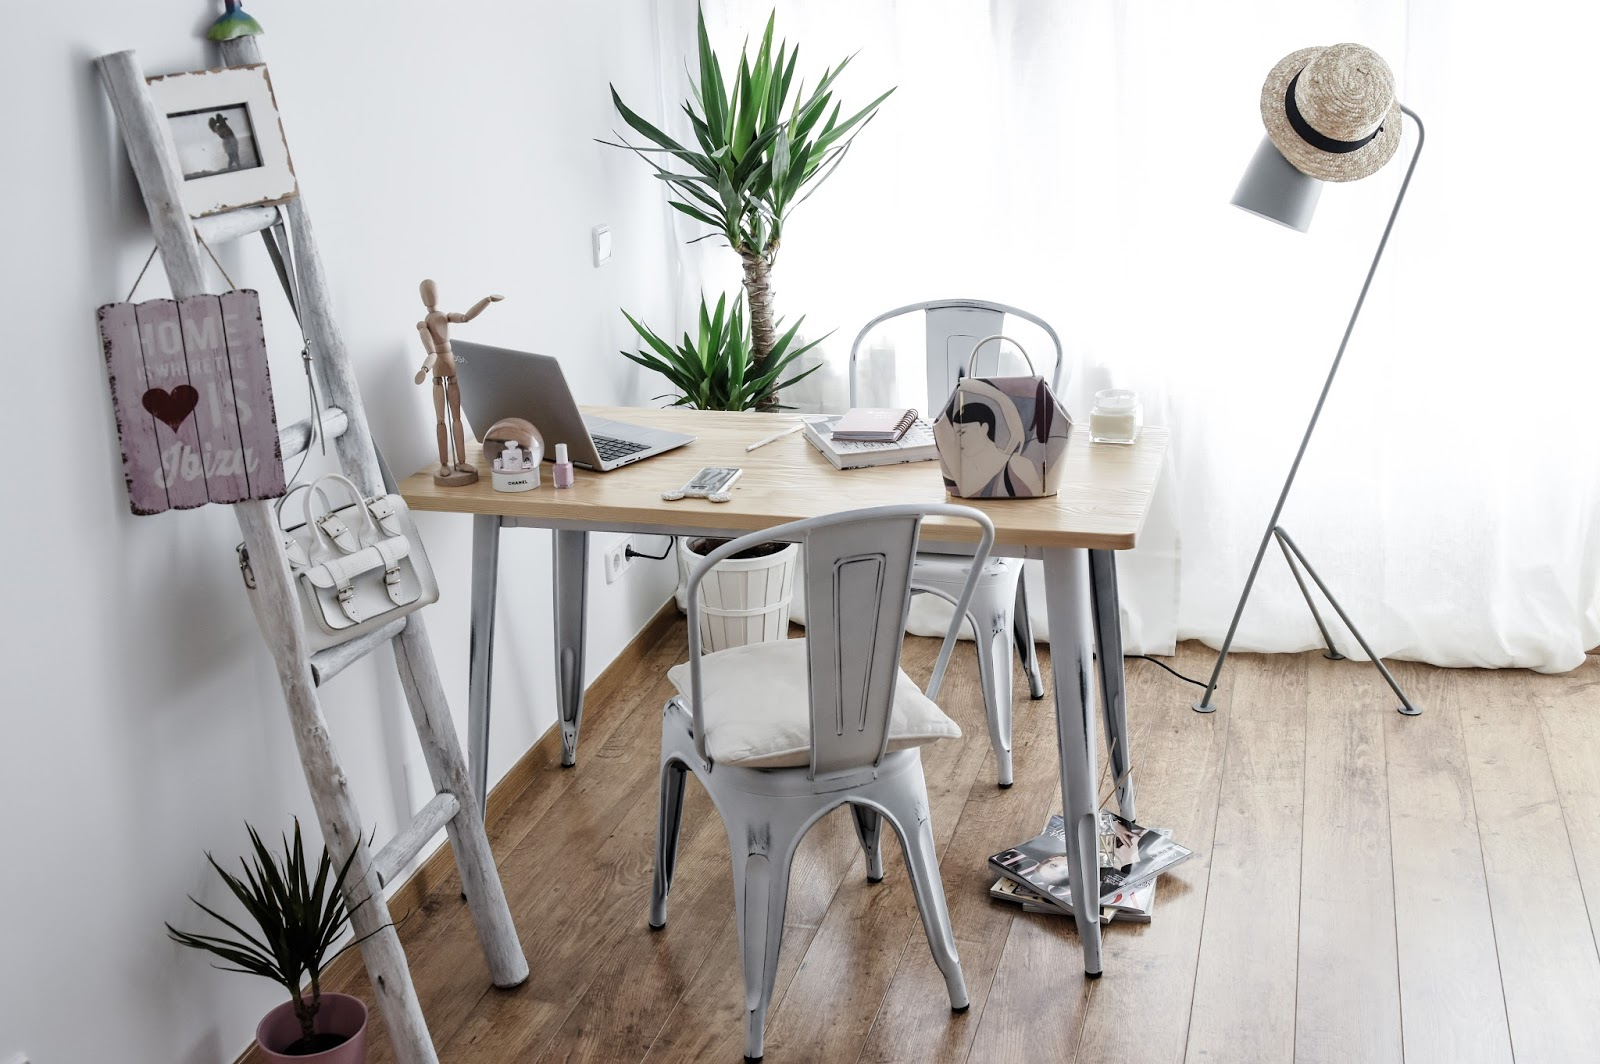 Deco Studio Sklum Industrial Style El Blog De Silvia Rodriguez  # Muebles Lifestyle